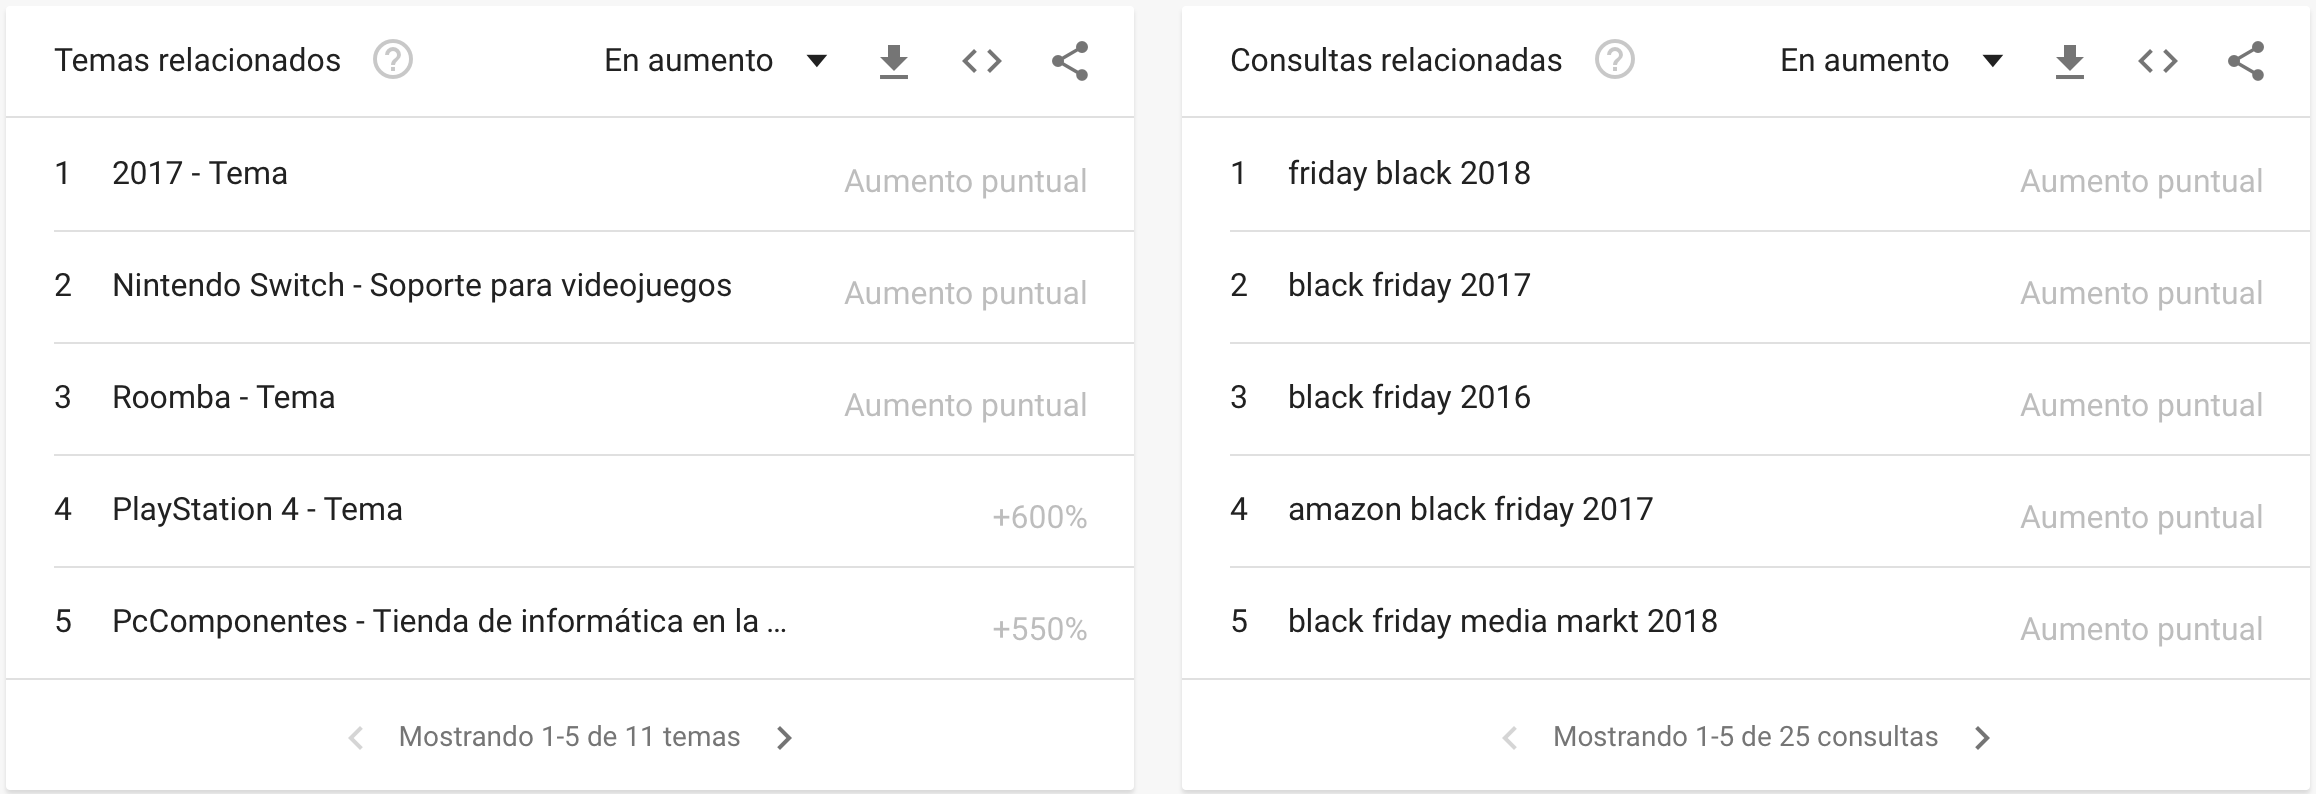 campaña de black friday - datos de búsquedas